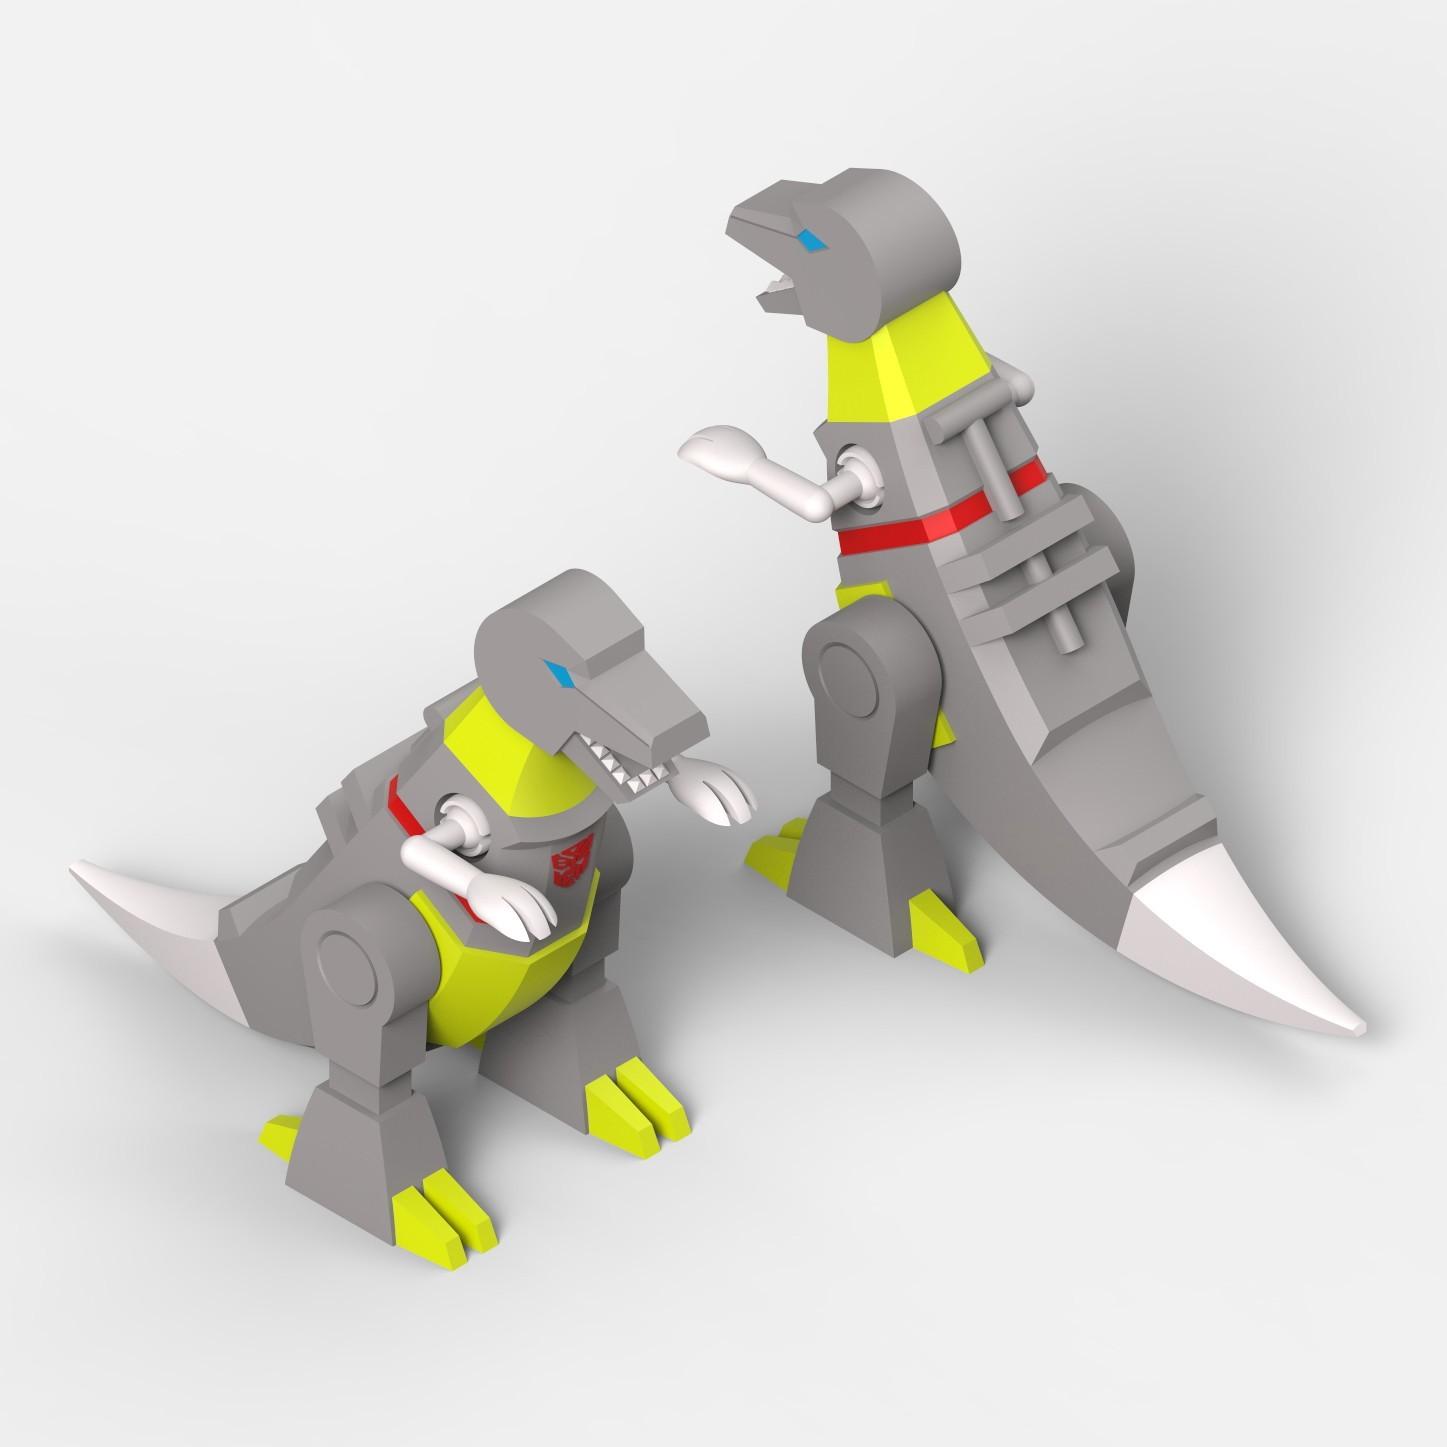 05_edit.jpg Download STL file Grimlock • Model to 3D print, biglildesign